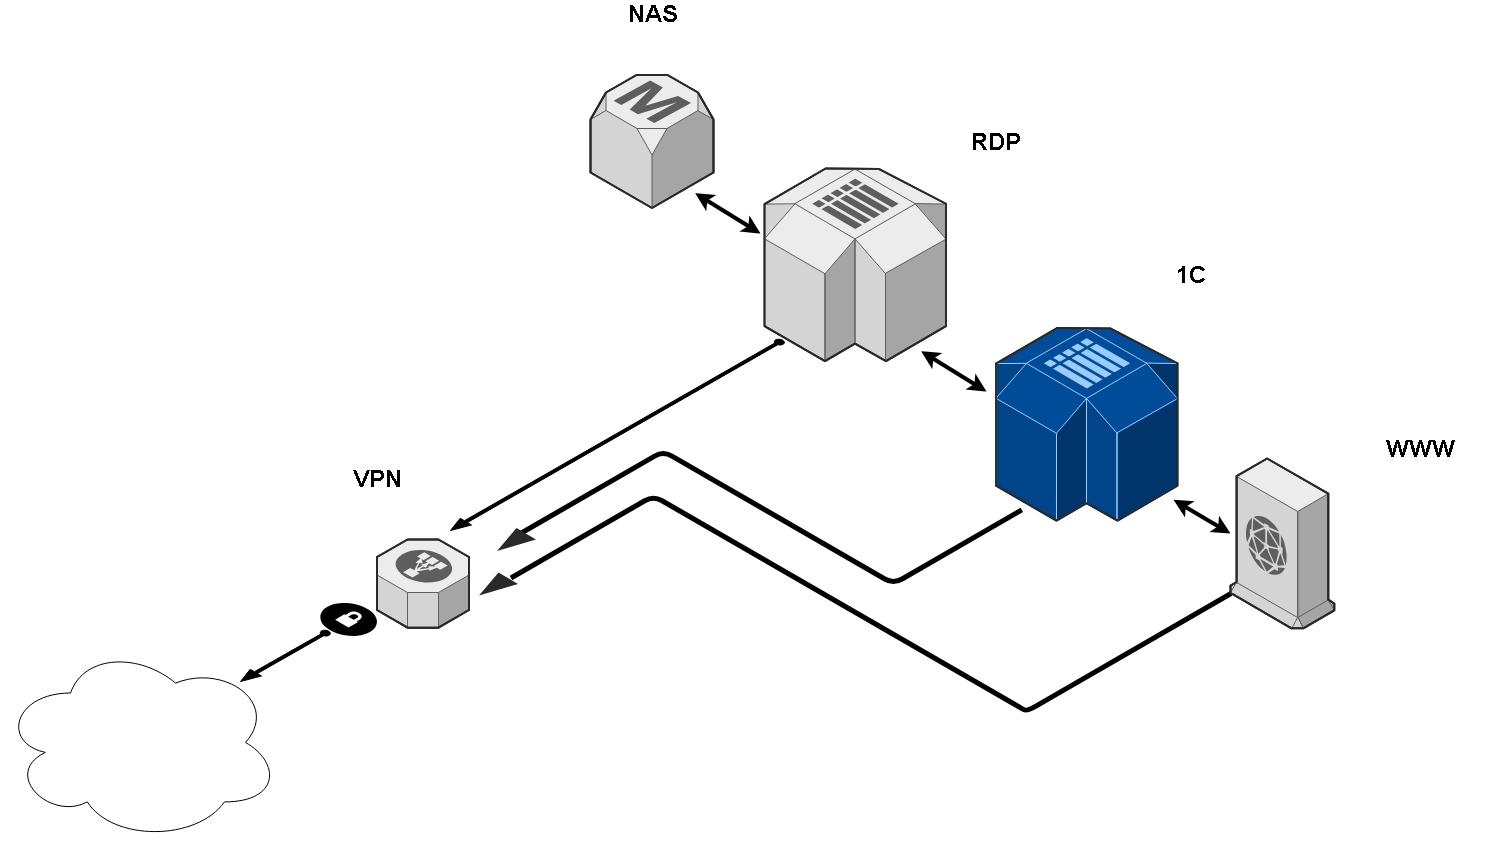 1C and Elastic Compute Service Alibaba Cloud - 20